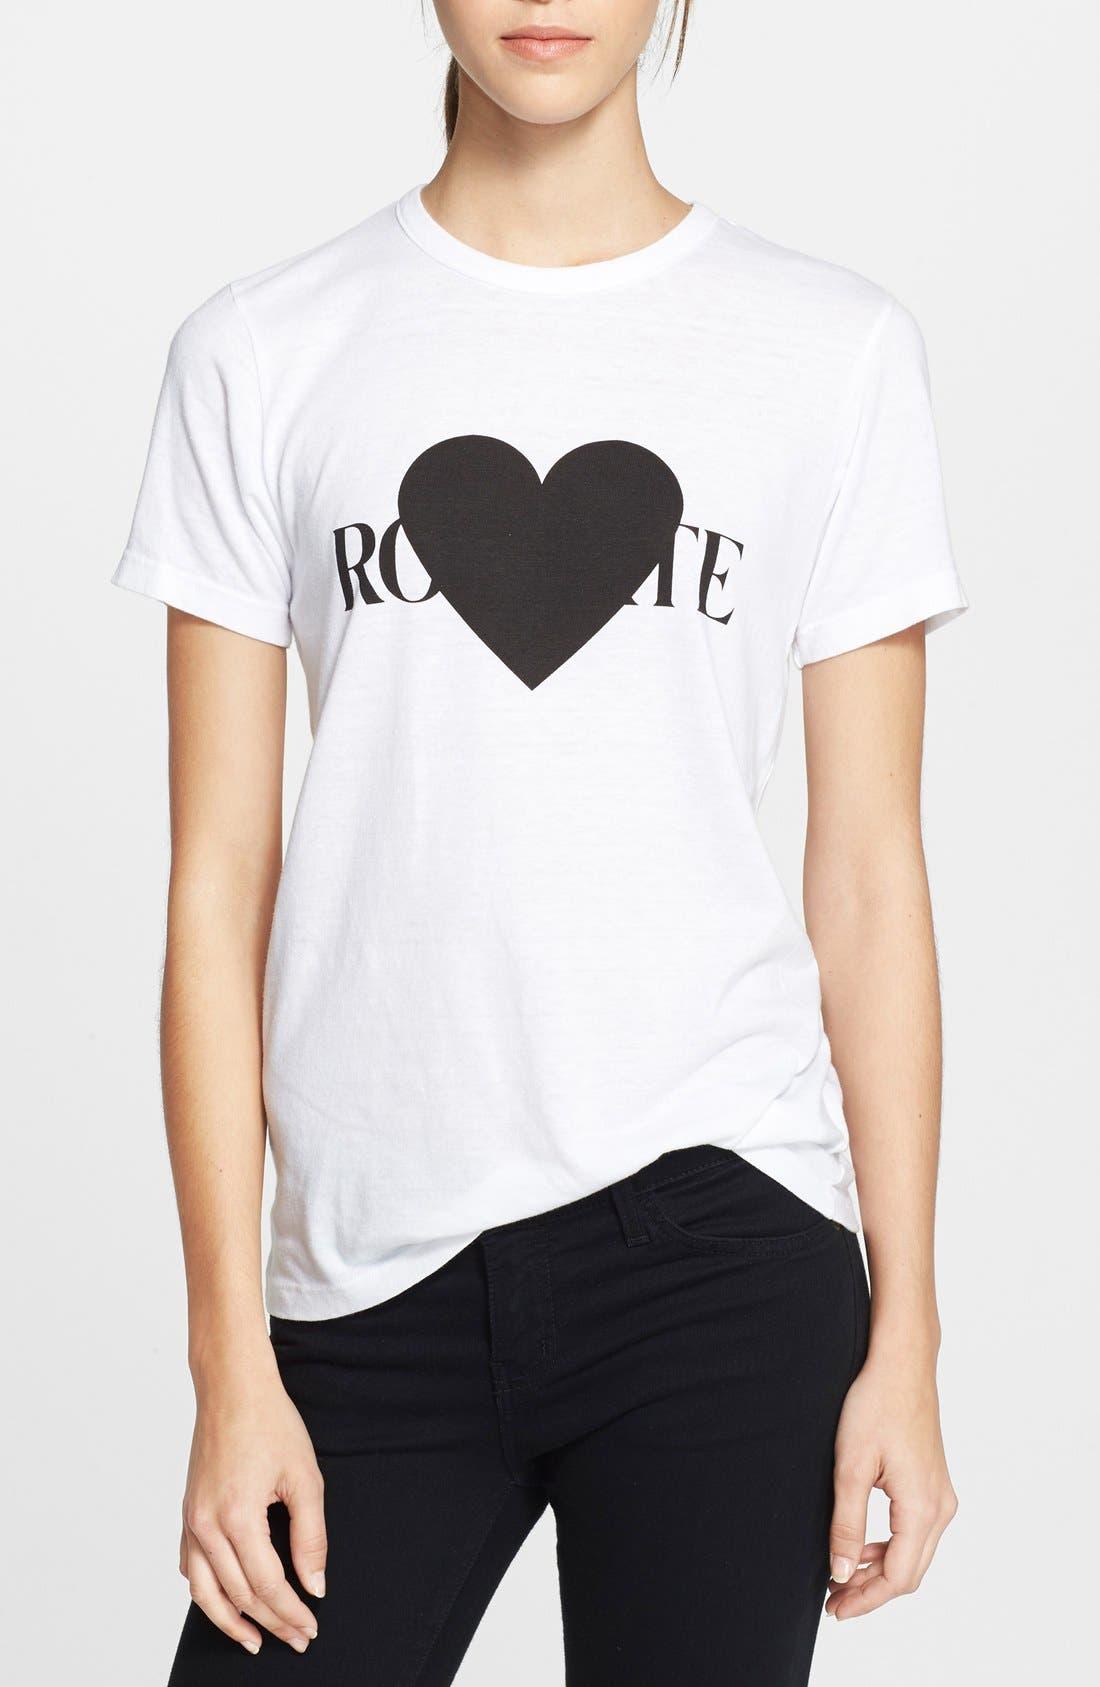 Alternate Image 1 Selected - Rodarte 'Rohearte' Heart Graphic Tee